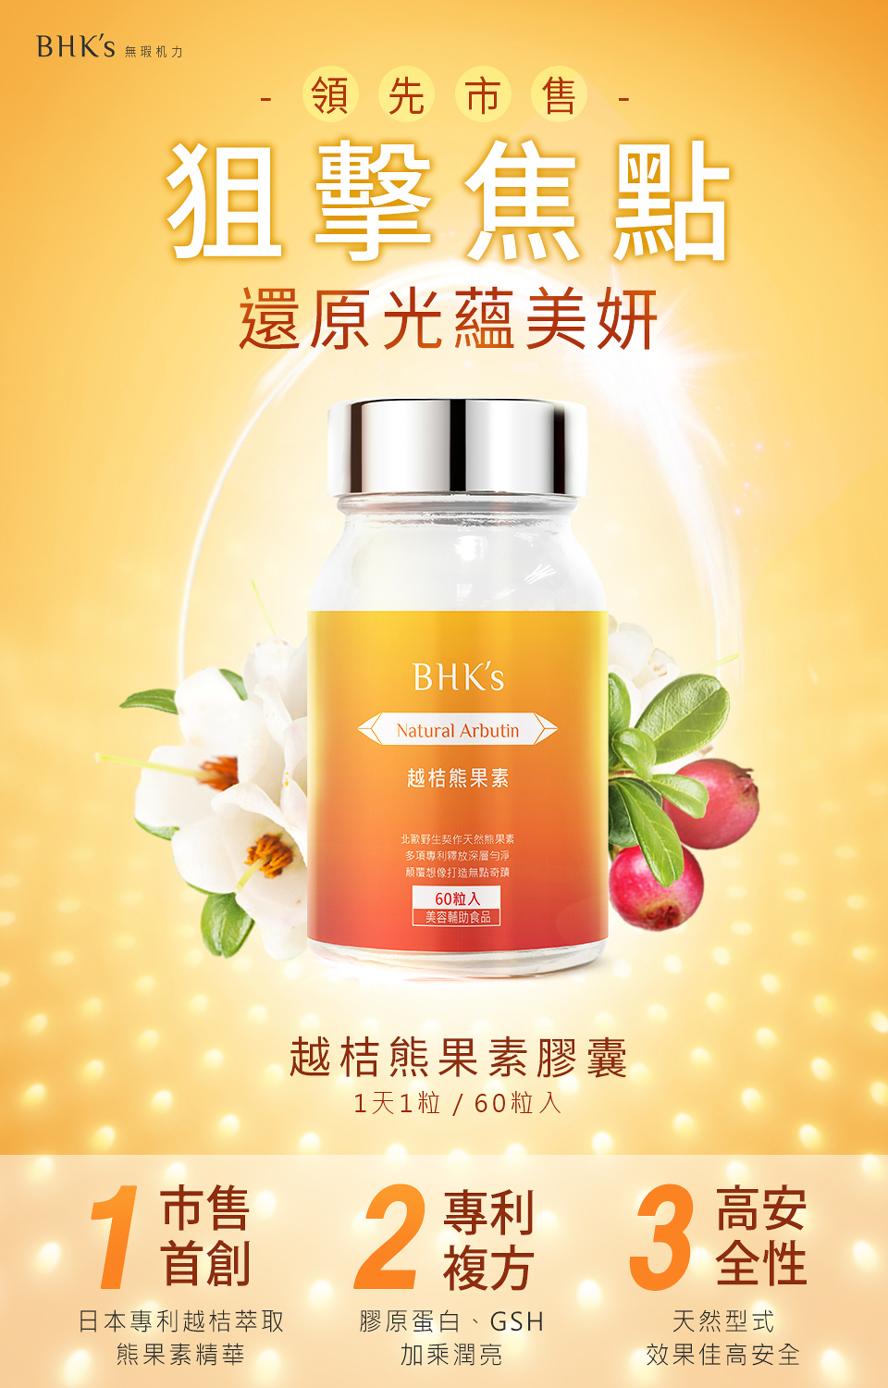 BHK's越桔熊果素有效去除斑點,還你乾淨臉蛋